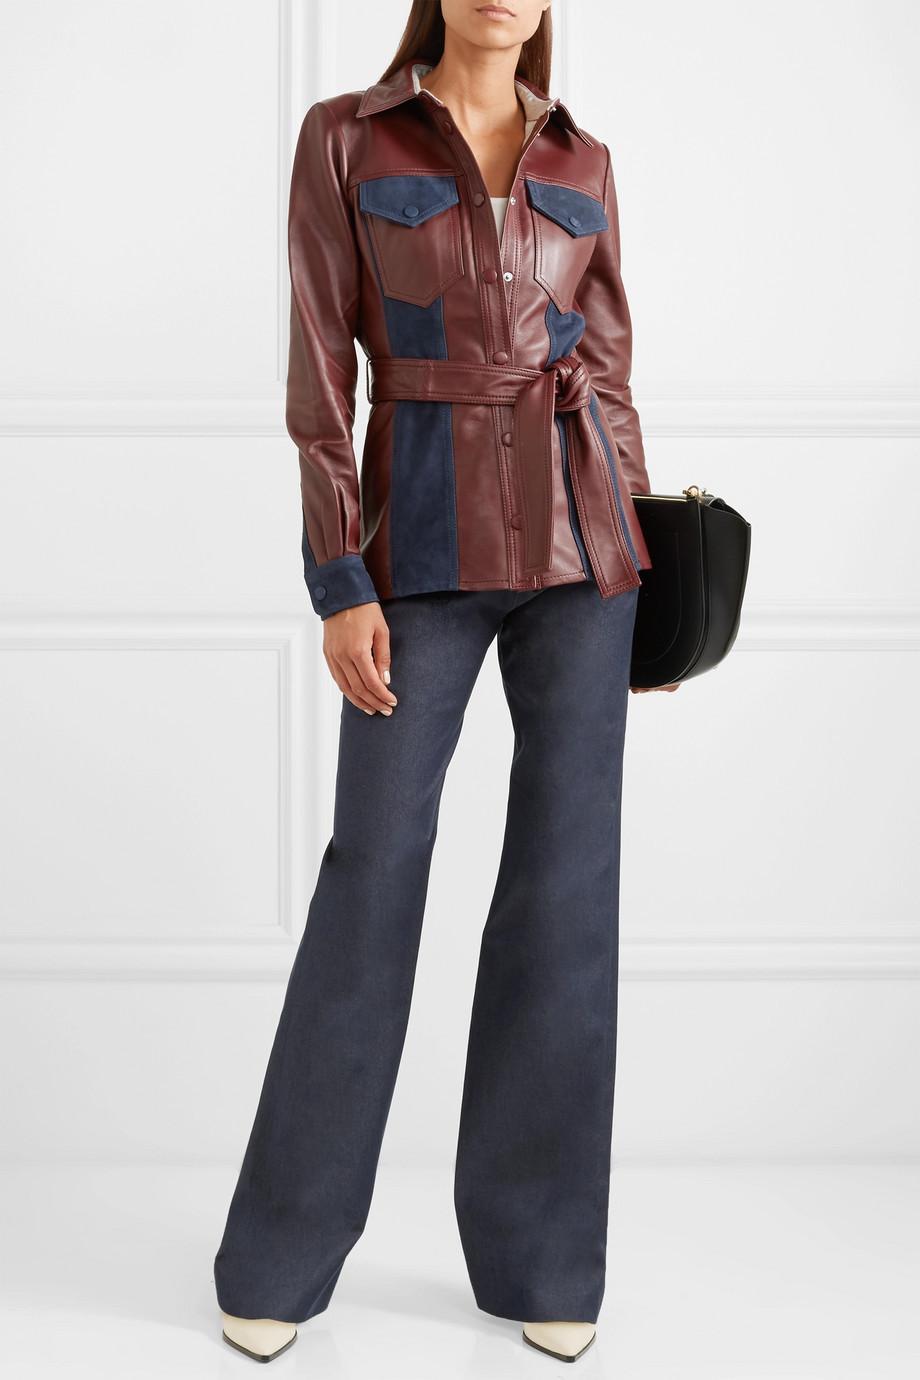 Victoria, Victoria Beckham Suede-paneled leather jacket $1,130